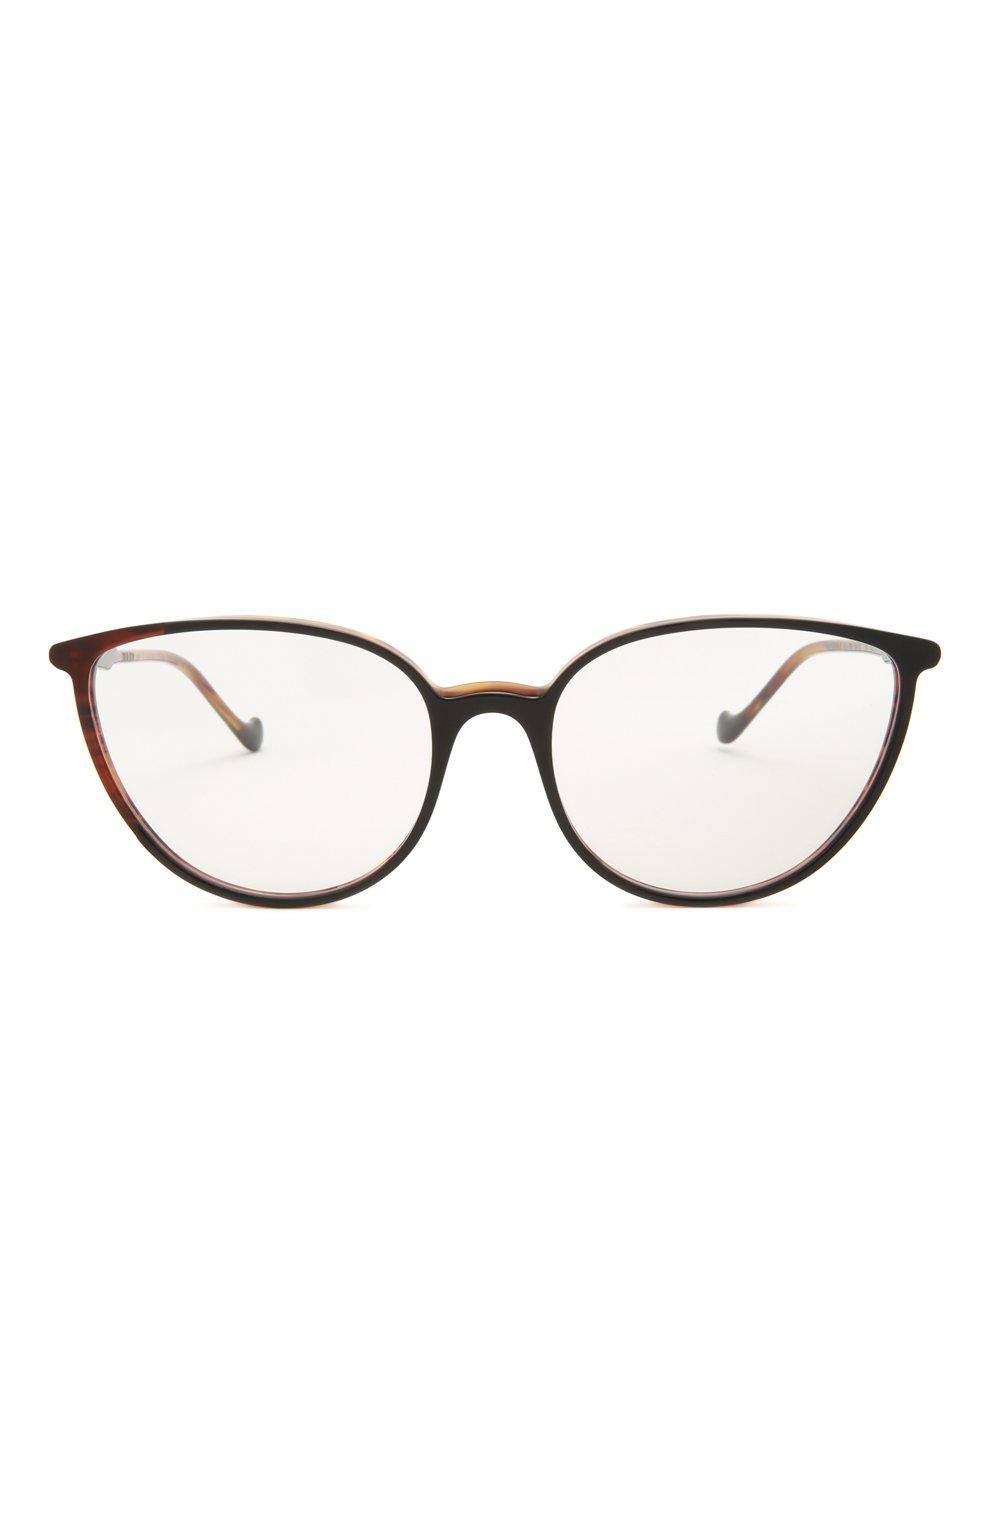 Женские оправа CAROLINE ABRAM коричневого цвета, арт. C0RALIE 671 | Фото 3 (Тип очков: Оправа; Оптика Гендер: оптика-женское; Очки форма: Cat-eye)